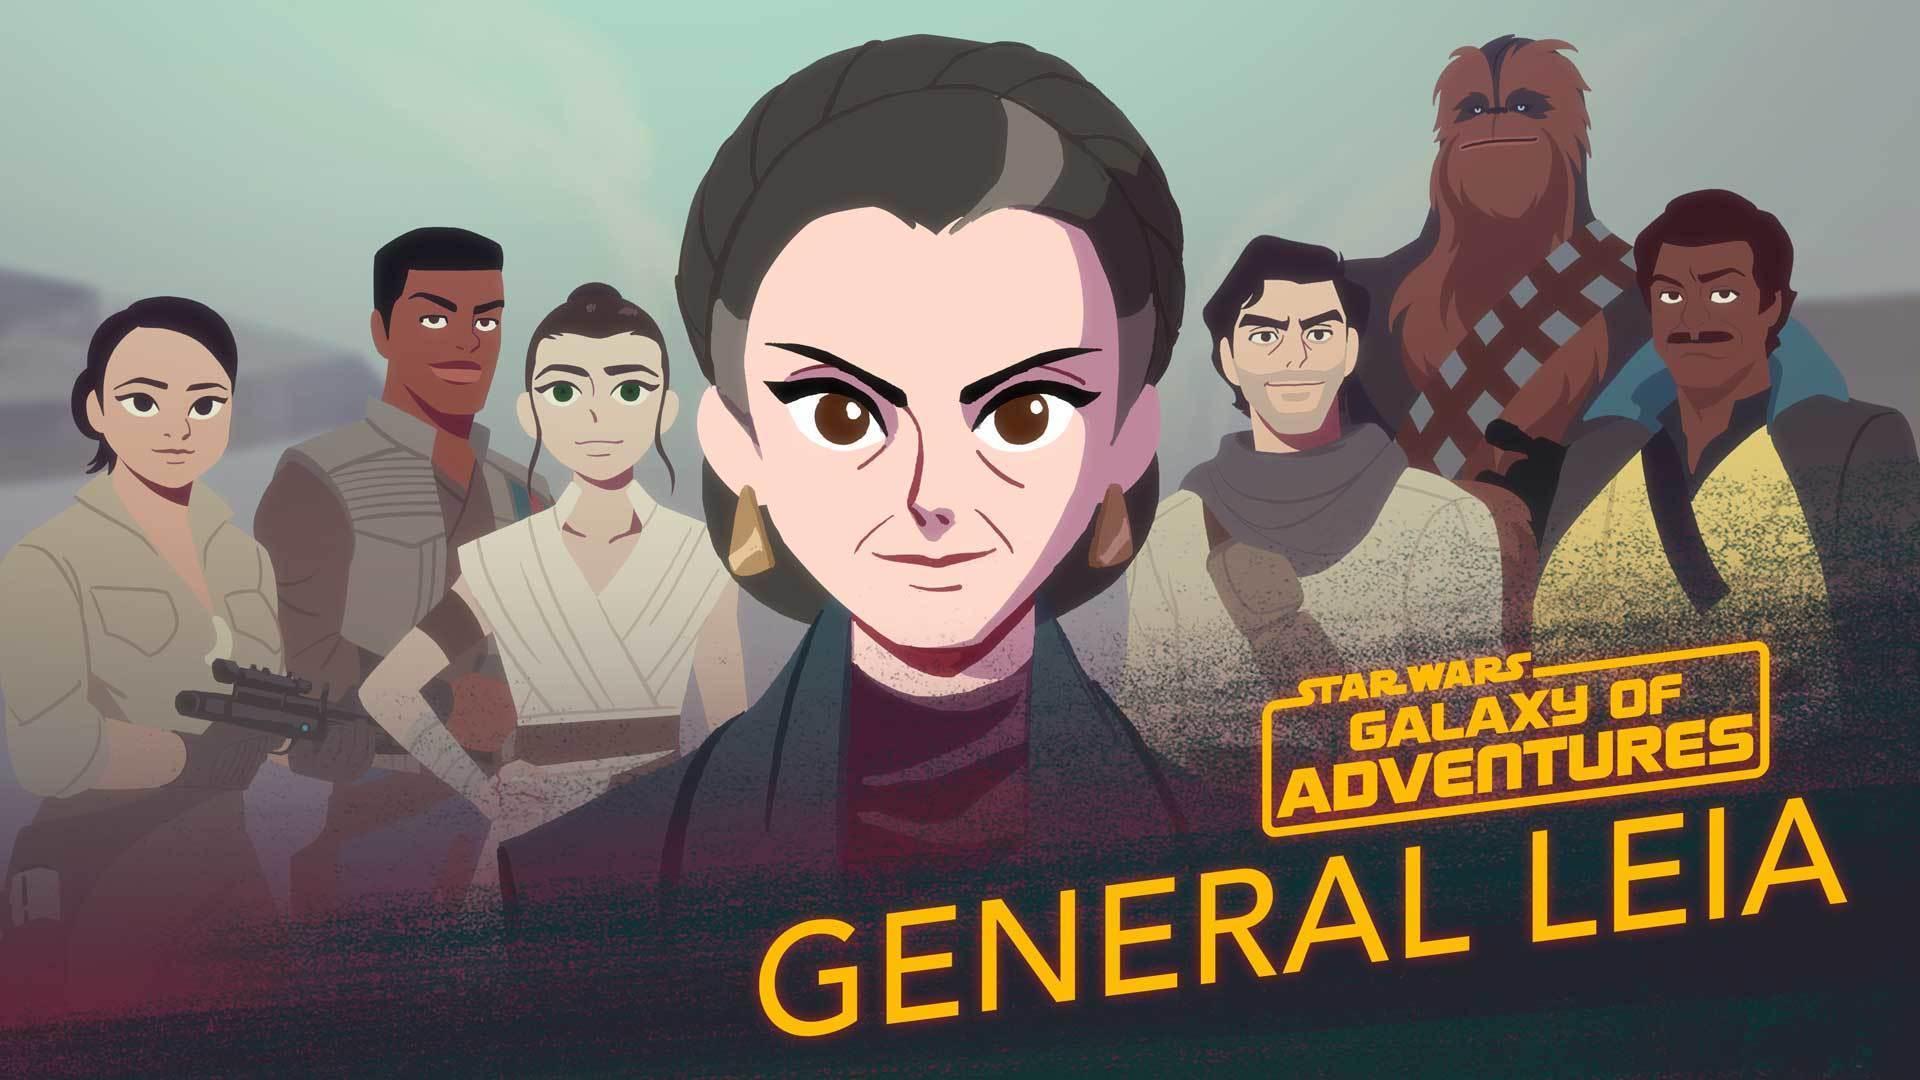 Leia Organa - A Princess, A General, A Mentor | Star Wars Galaxy of Adventures